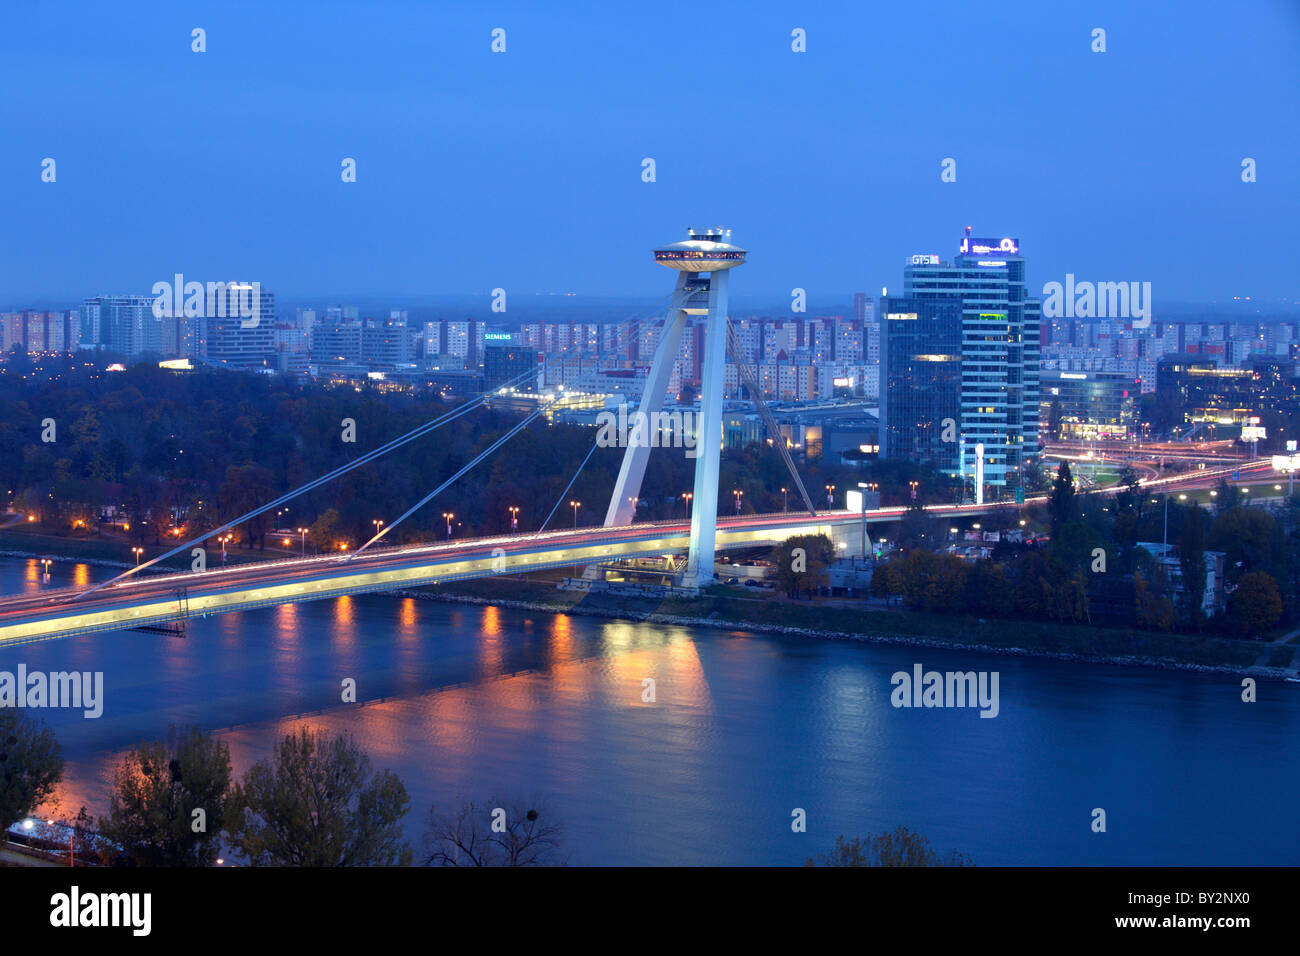 Novy Most bridge over the Danube river, Bratislava, Slovakia - Stock Image